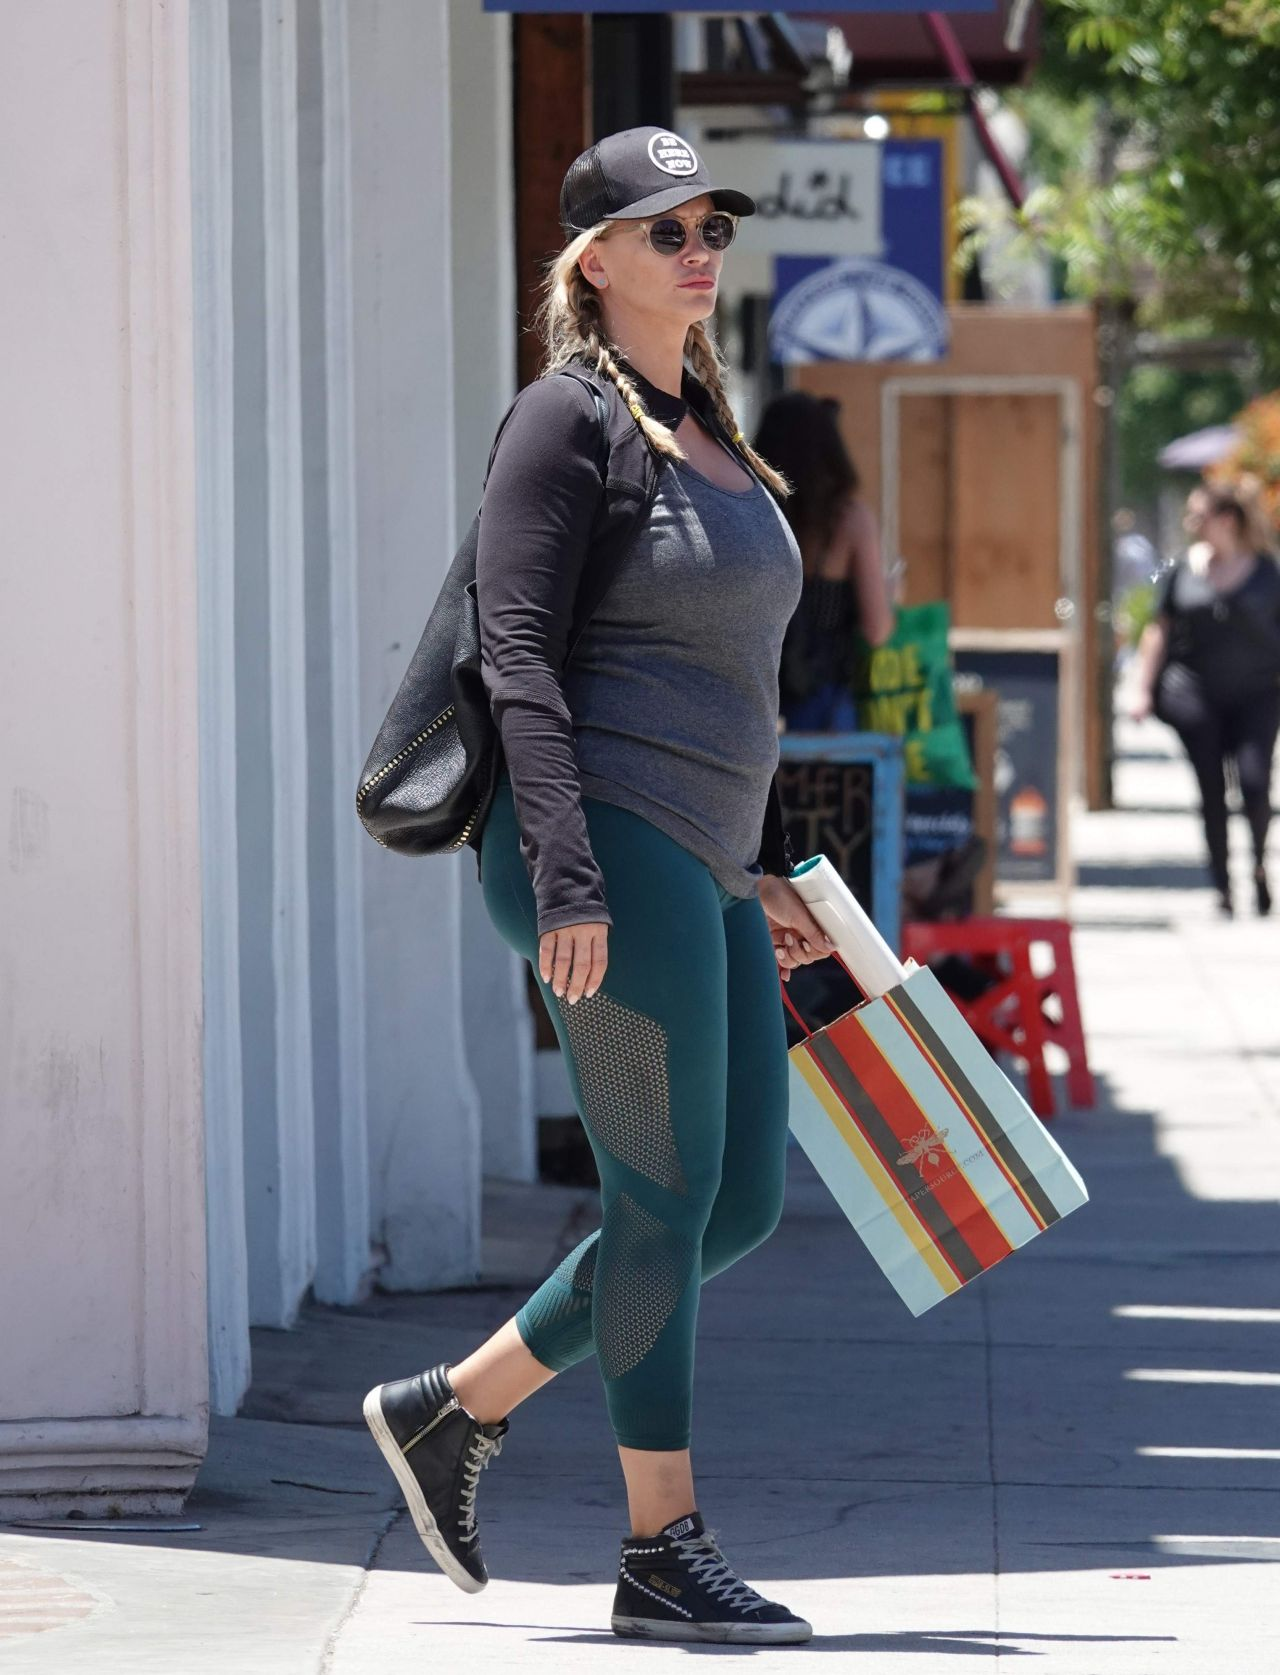 Natasha Henstridge In Tights Shopping In Los Angeles 06